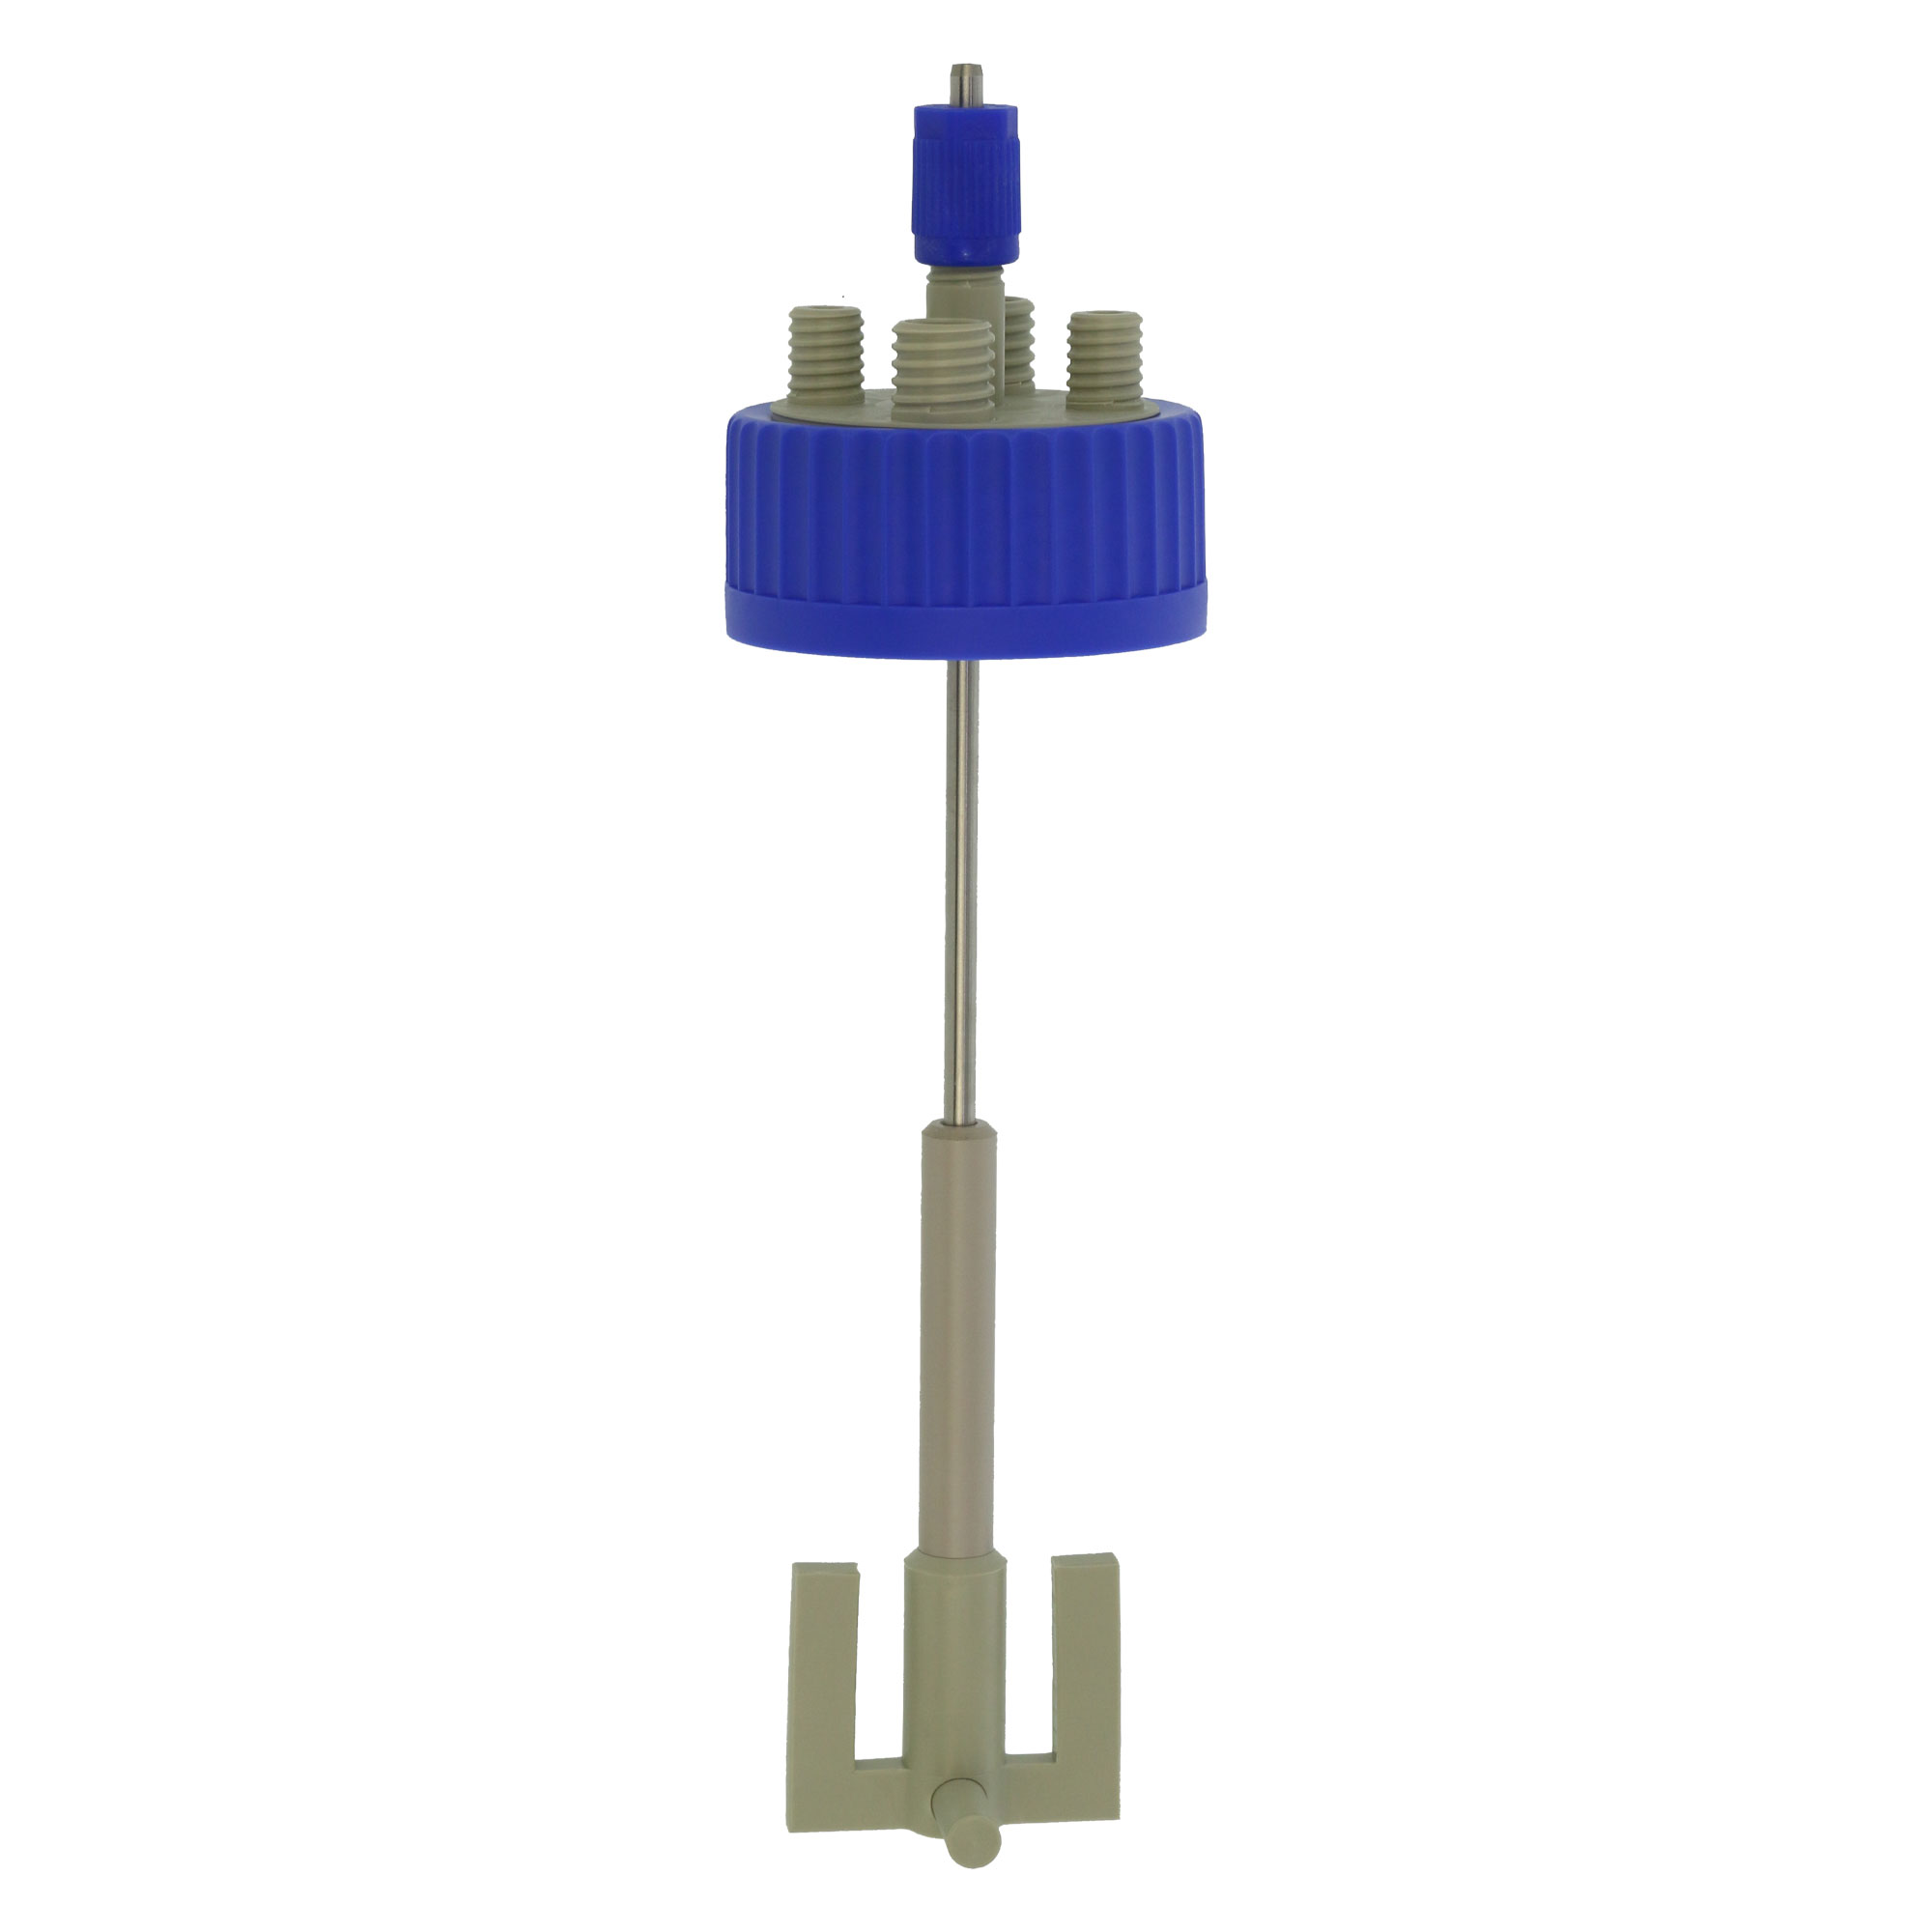 DURAN GLS-80 撹拌反応容器用キャップセット(シャフト付き)